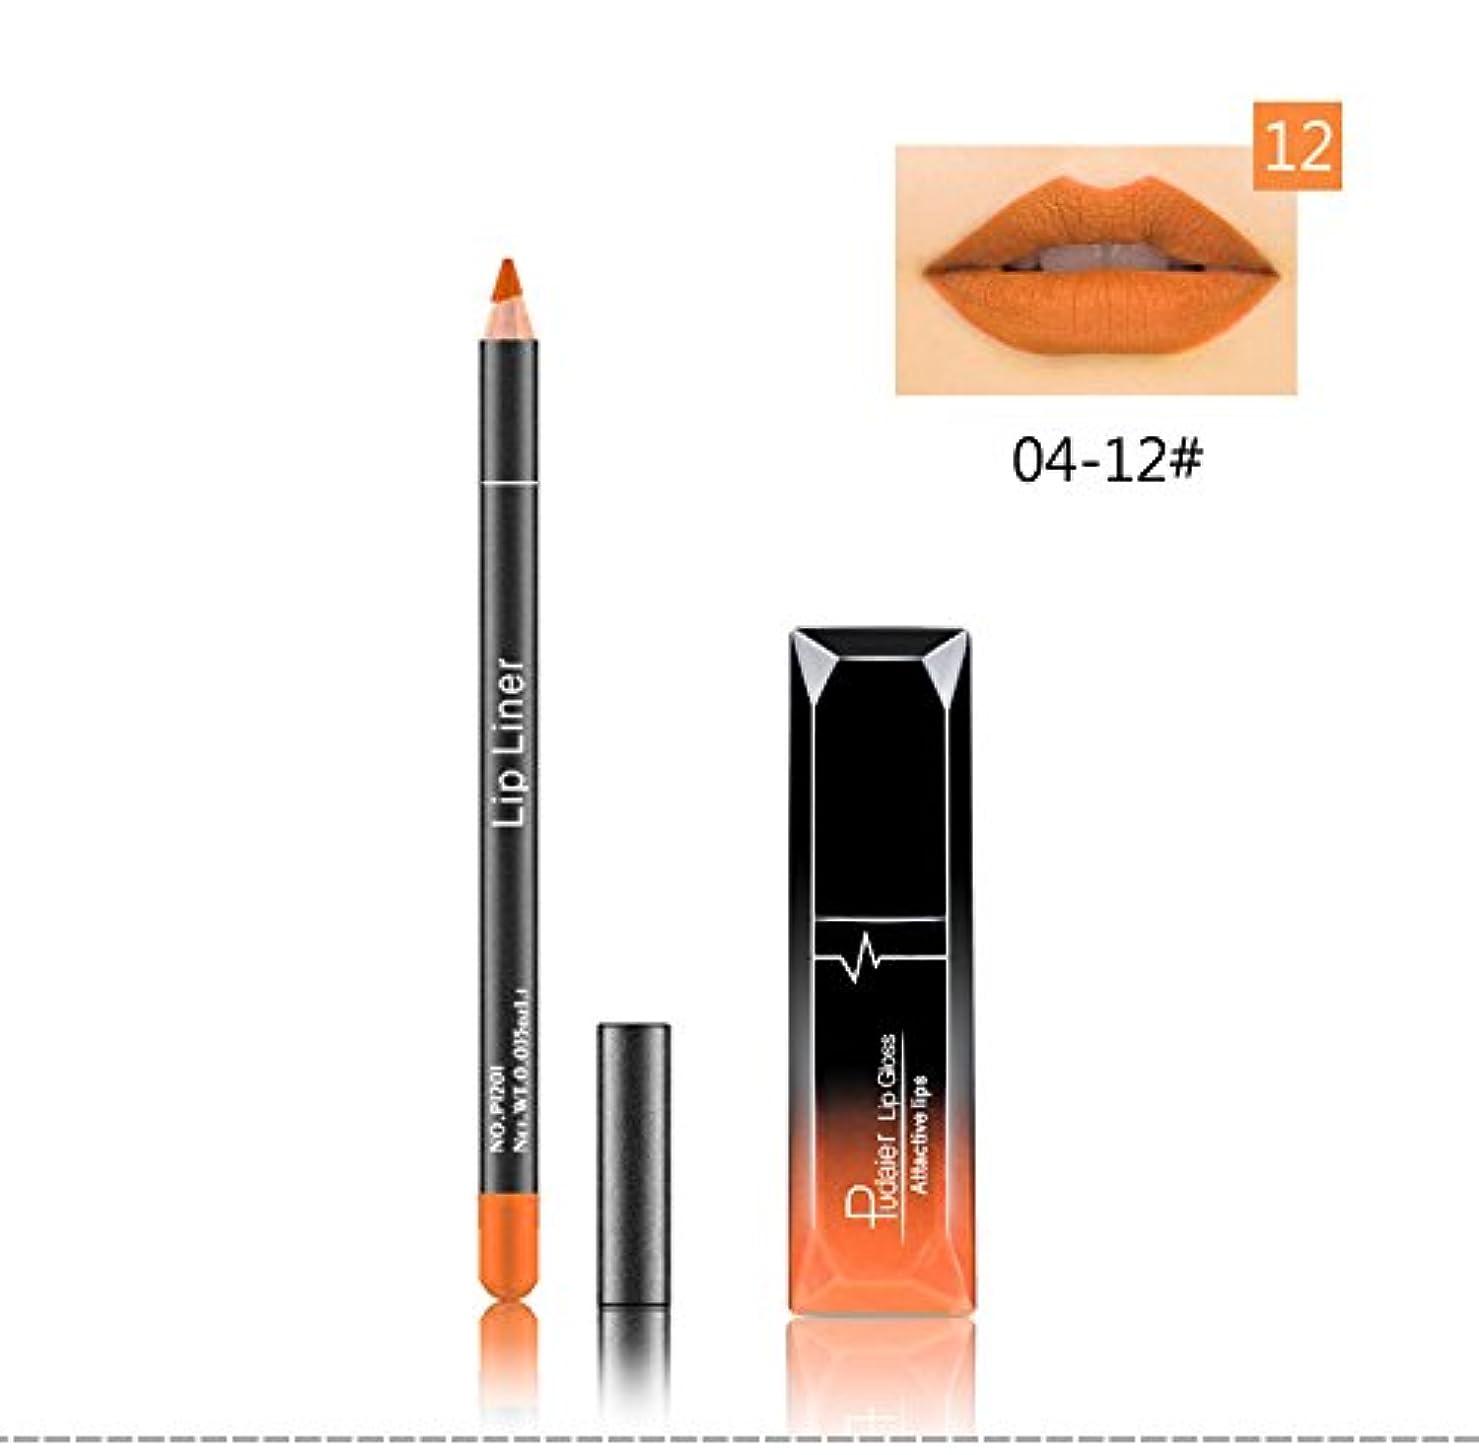 大胆不敵準拠学校教育(12) Pudaier 1pc Matte Liquid Lipstick Cosmetic Lip Kit+ 1 Pc Nude Lip Liner Pencil MakeUp Set Waterproof Long Lasting Lipstick Gfit